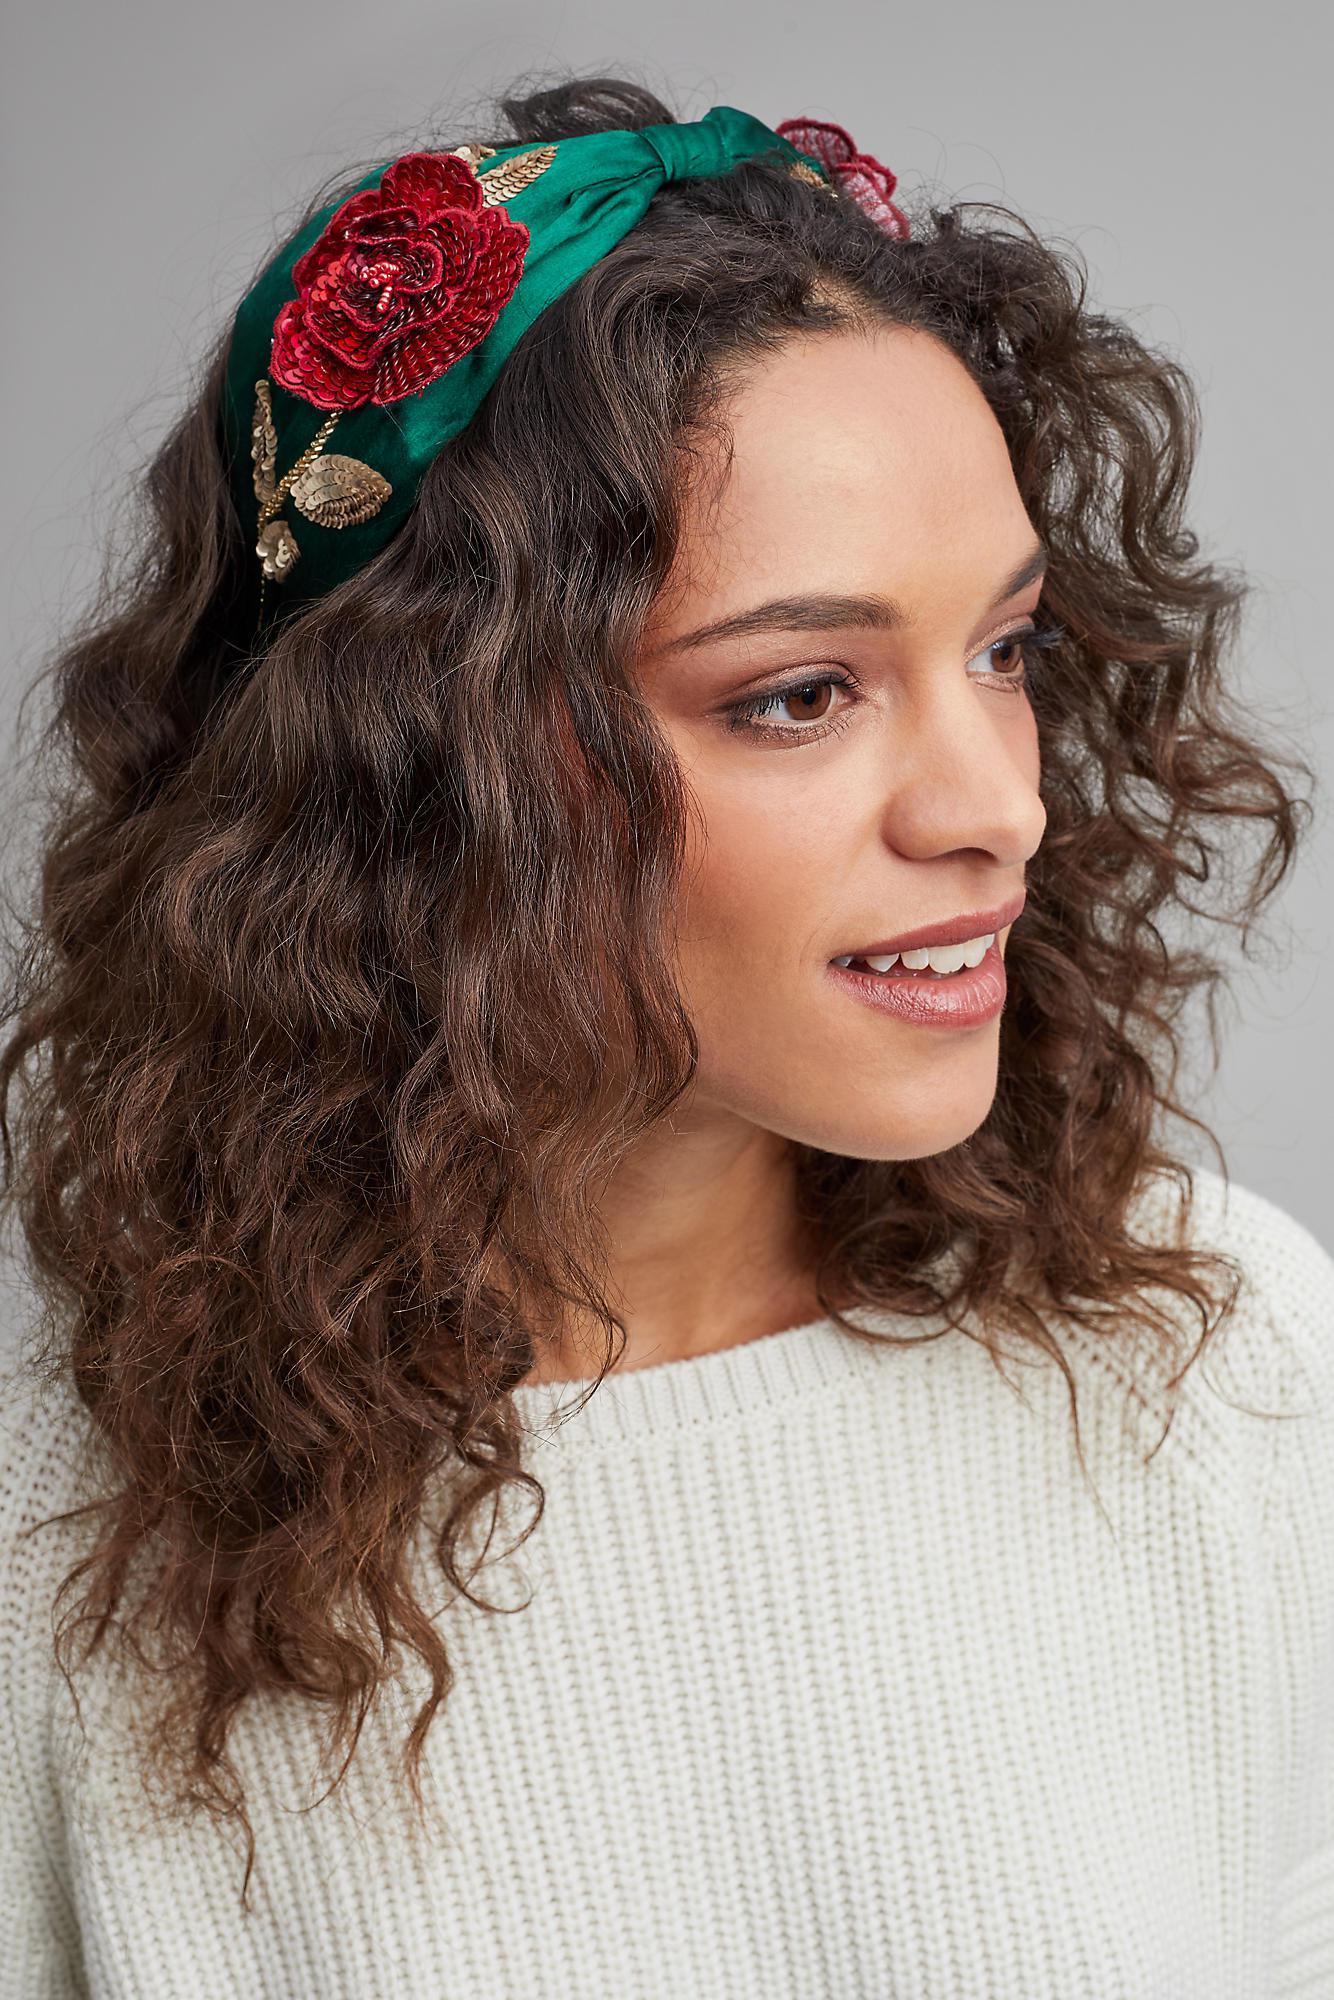 Anthropologie Rose Embellished Turban Headband in Green - Lyst c4c23cb22ef